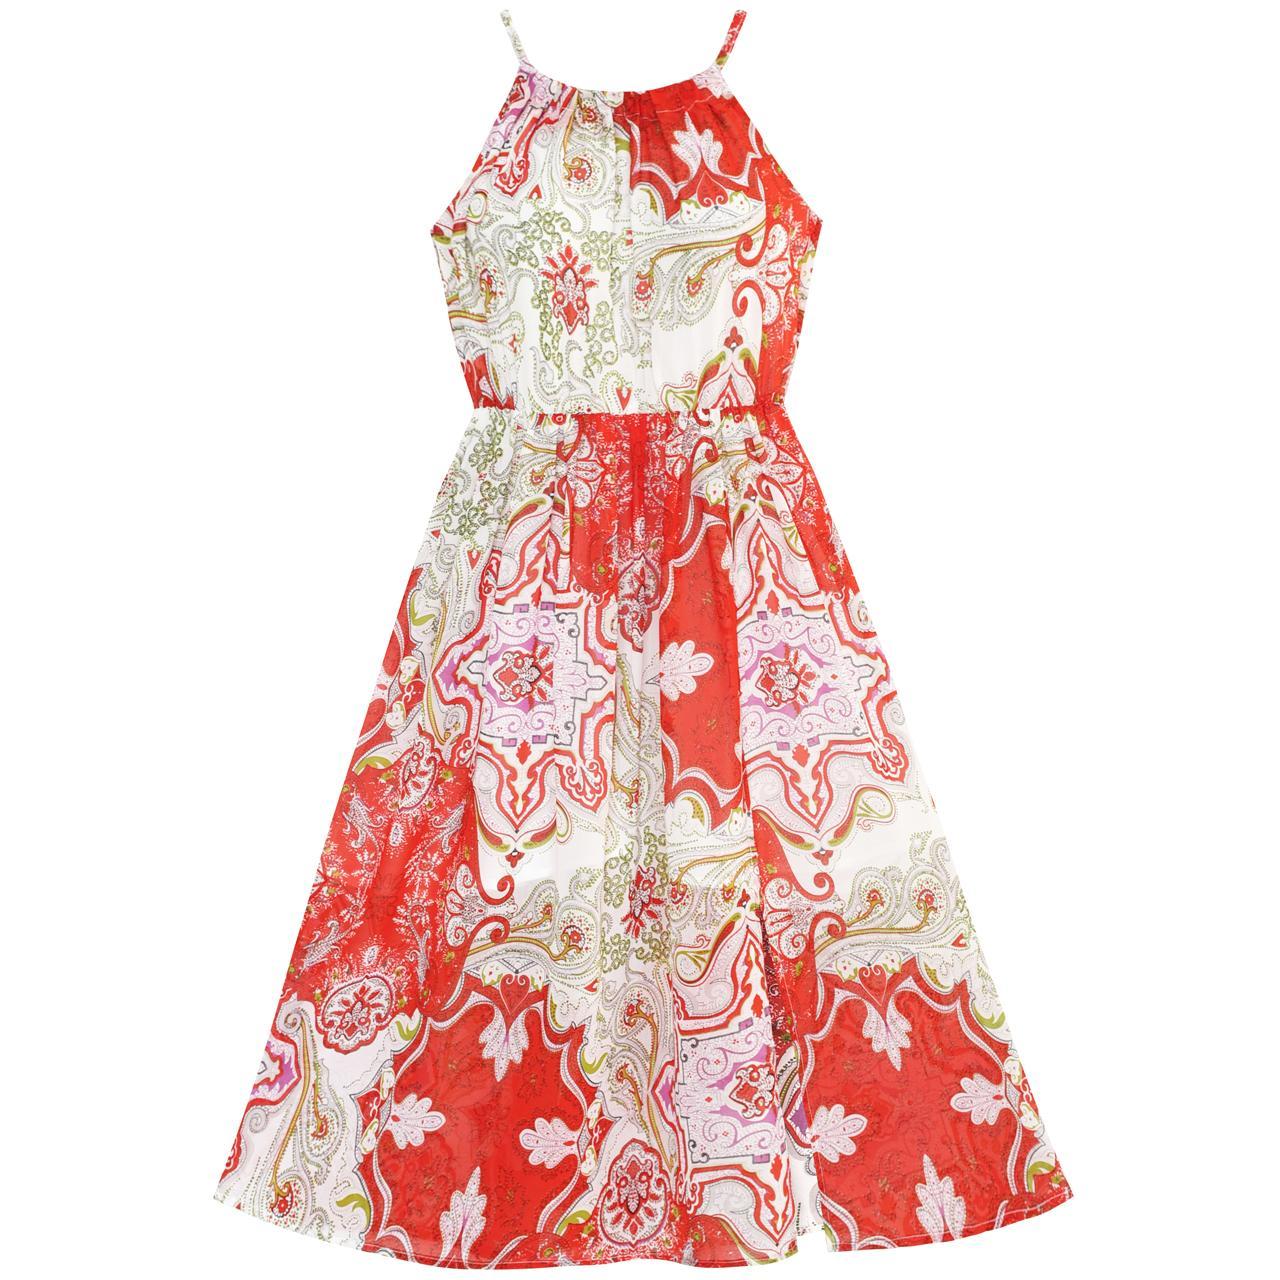 все цены на Sunny Fashion Flower Girl Dress Red Floral Chiffon Slip Midi Dress Summer Beach Party 2018 Summer Princess Wedding Size 7-14